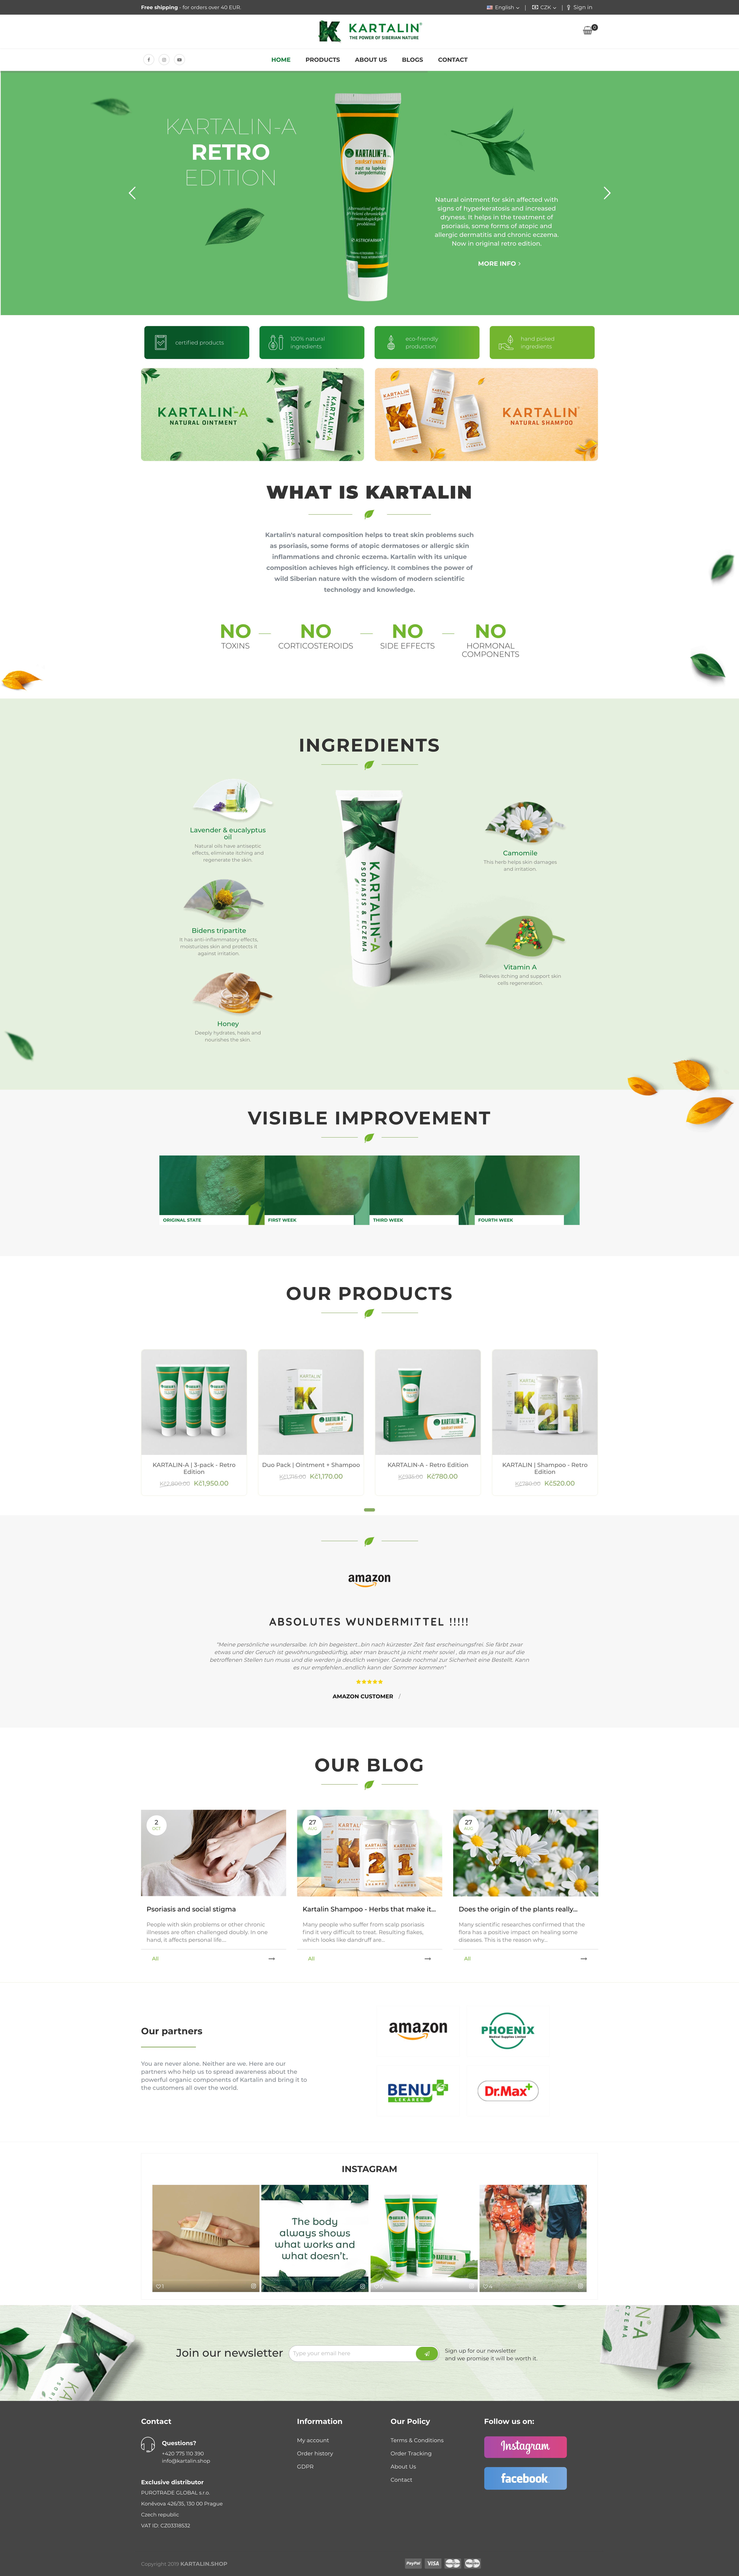 Kartalin Shop - home page